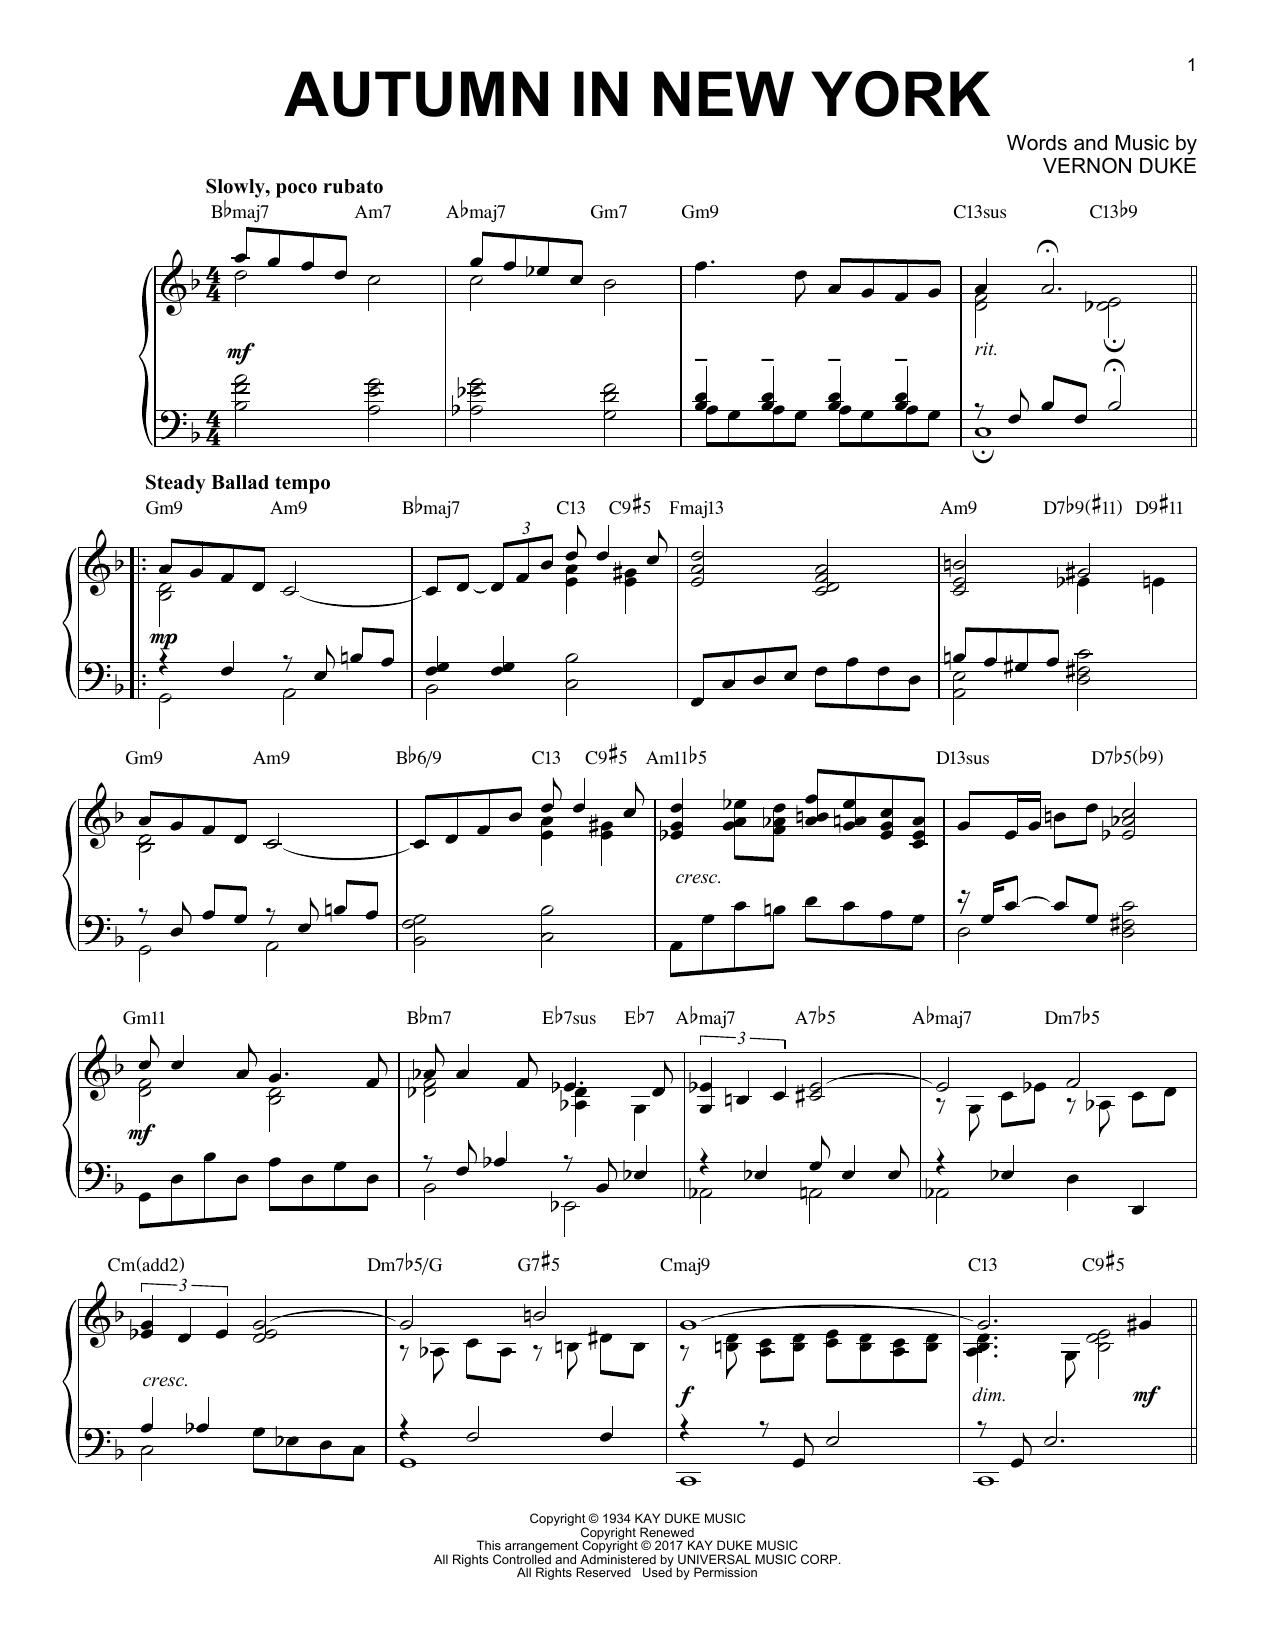 Vernon Duke Autumn In New York [Jazz version] sheet music notes and chords. Download Printable PDF.